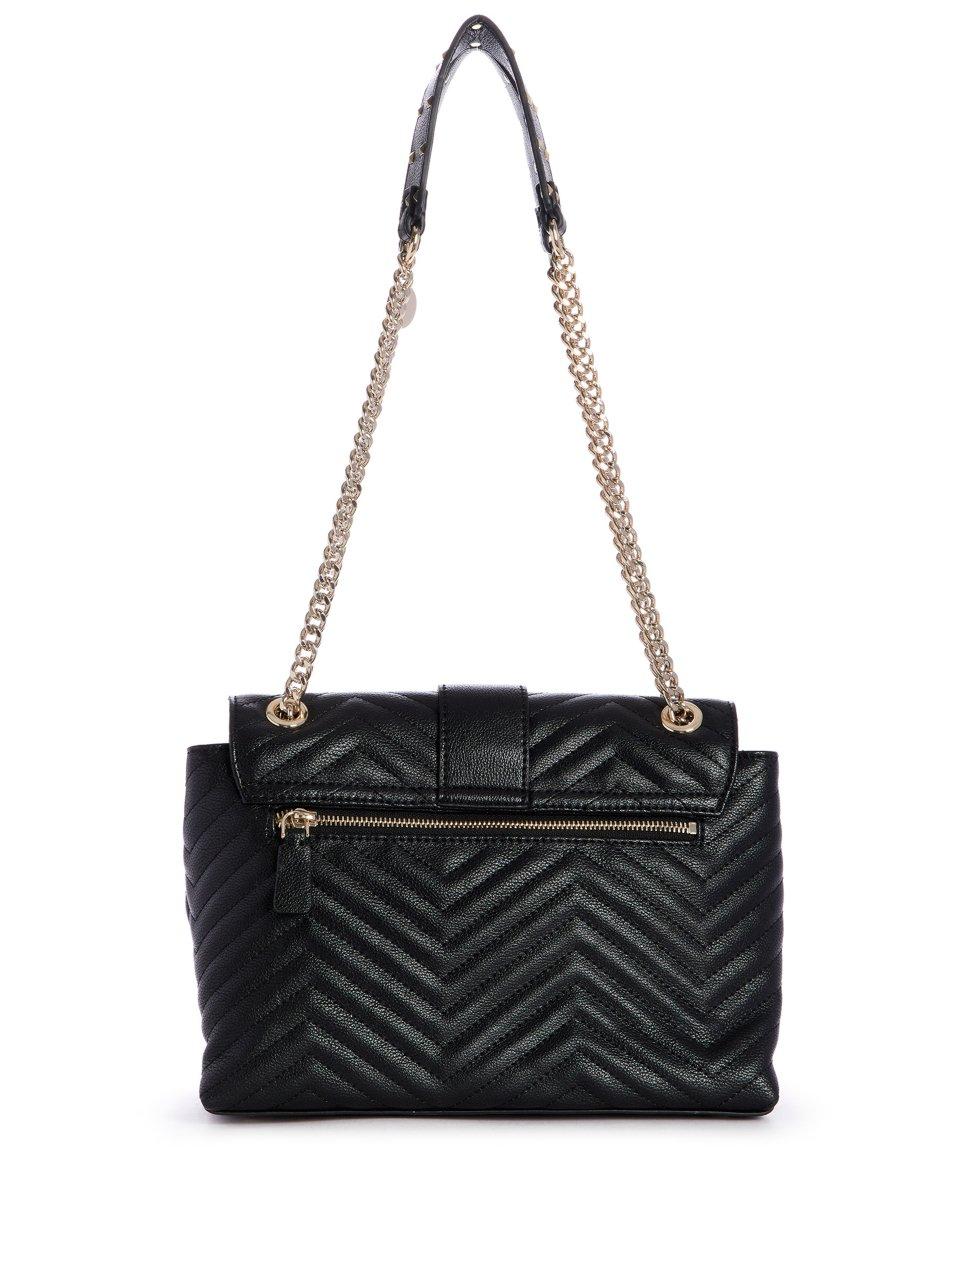 Guess Bag For Women,Mauve Crossbody Bag